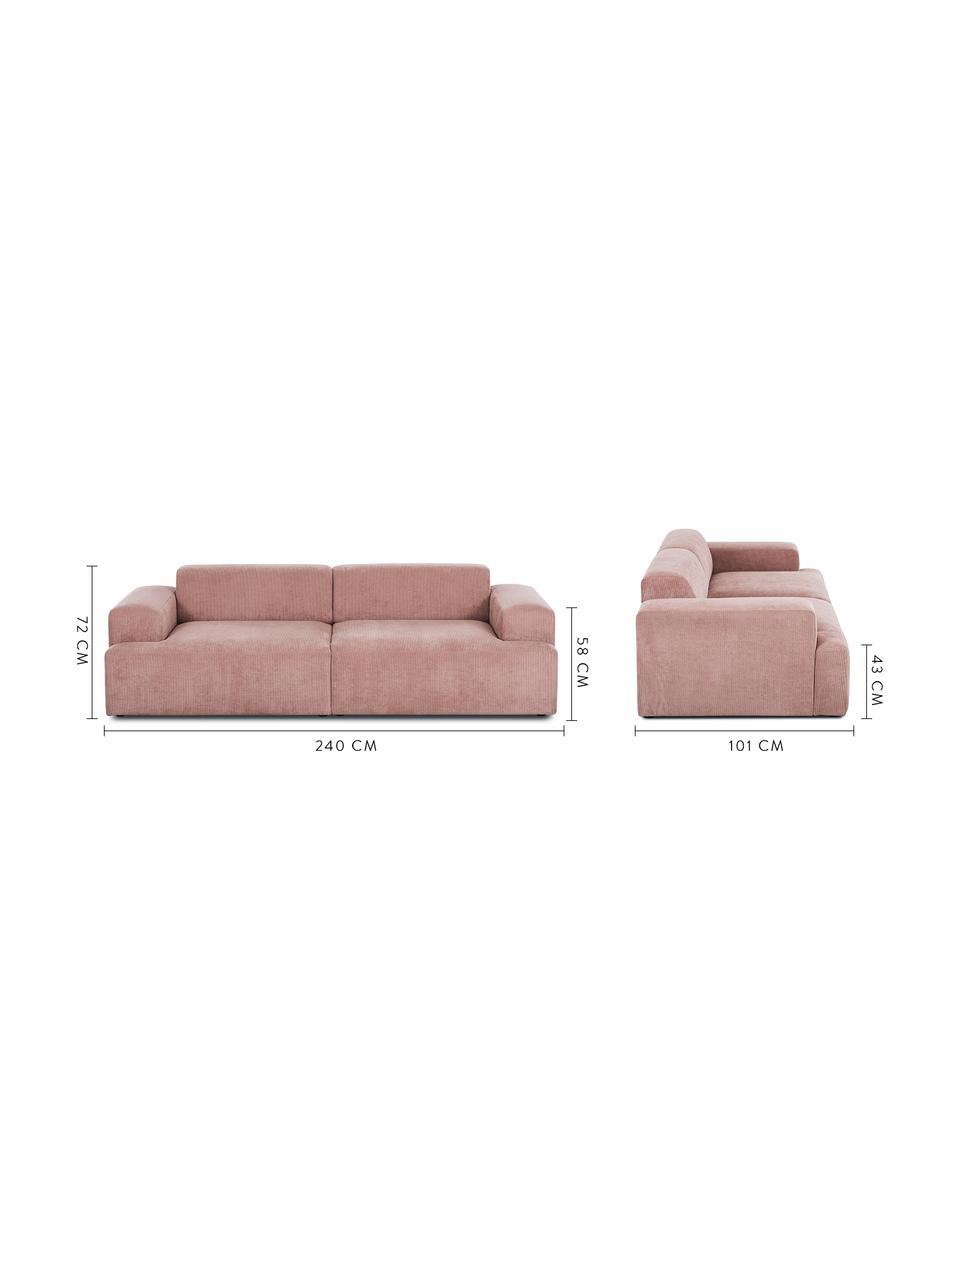 Corduroy bank Melva (3-zits) in roze, Bekleding: Koord (92% polyester, 8% , Frame: massief grenenhout, spaan, Poten: grenenhout De poten bevin, Roze, B 240 x D 101 cm